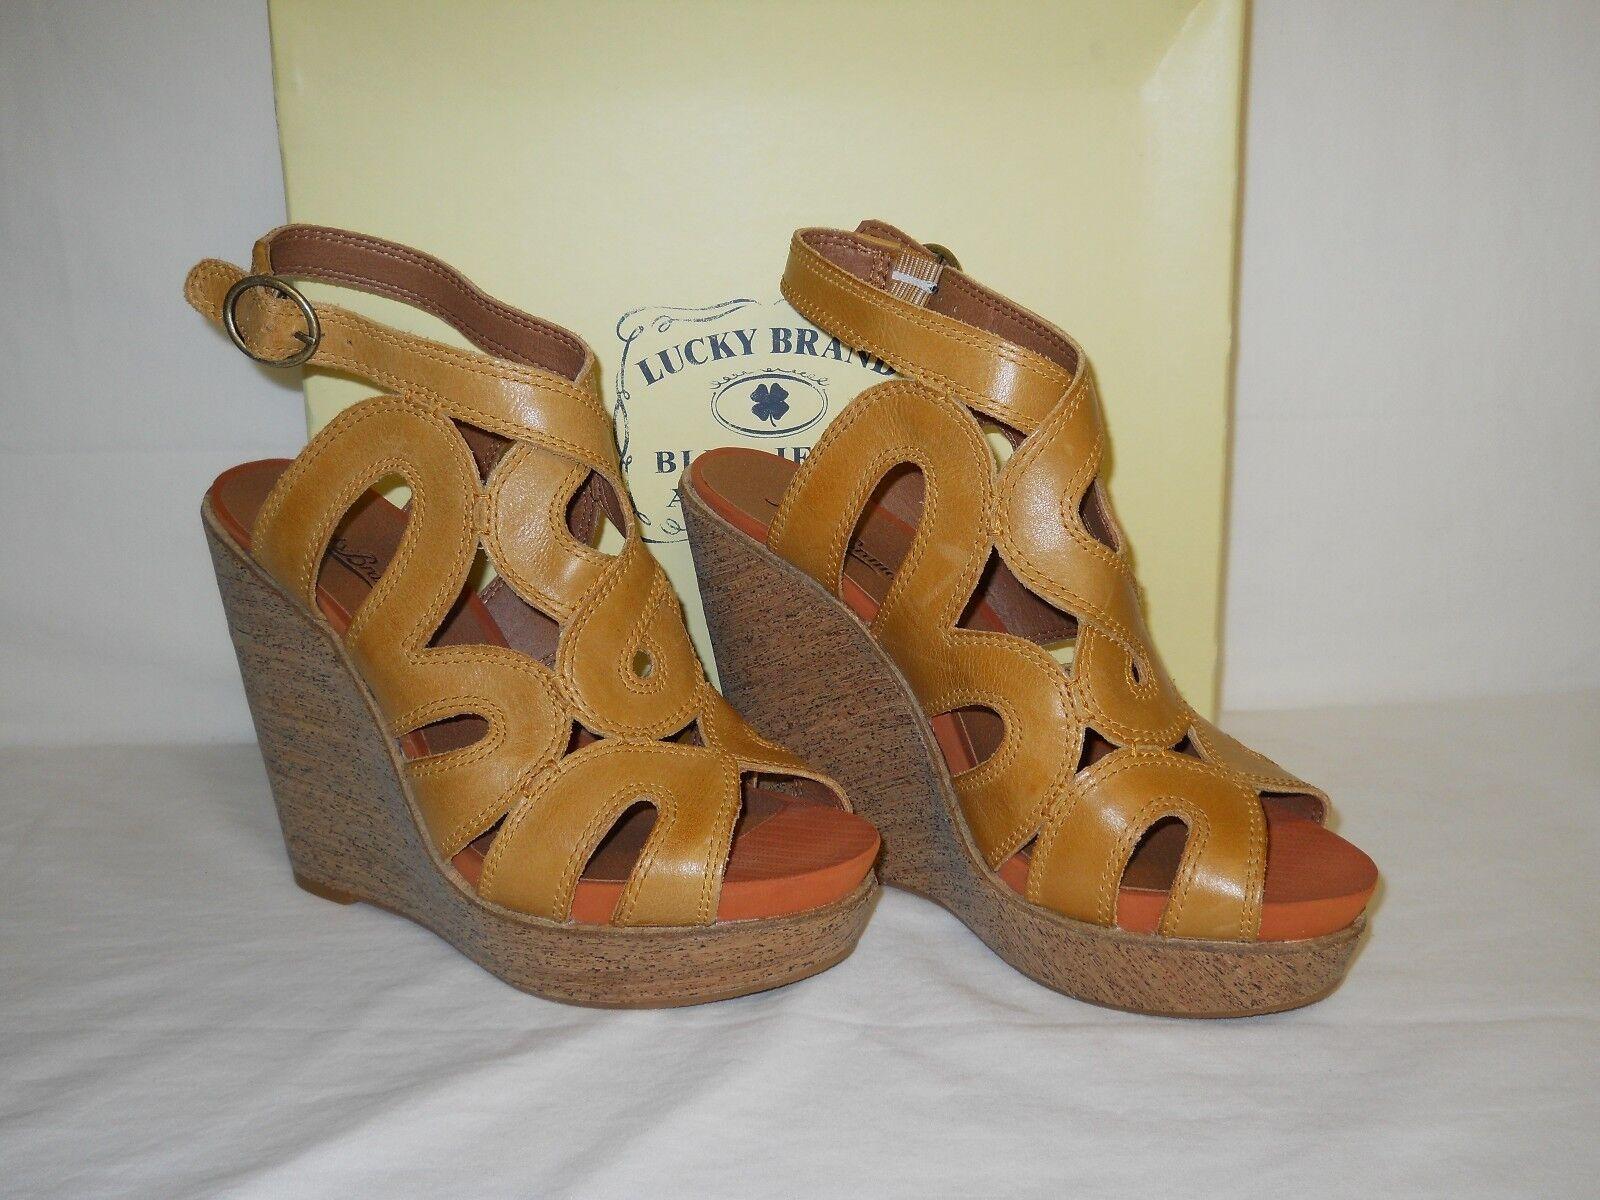 Lucky Brand New Damenschuhe Penrose Penrose Penrose Wedge Heels 9.5 M Schuhes NWB de273c